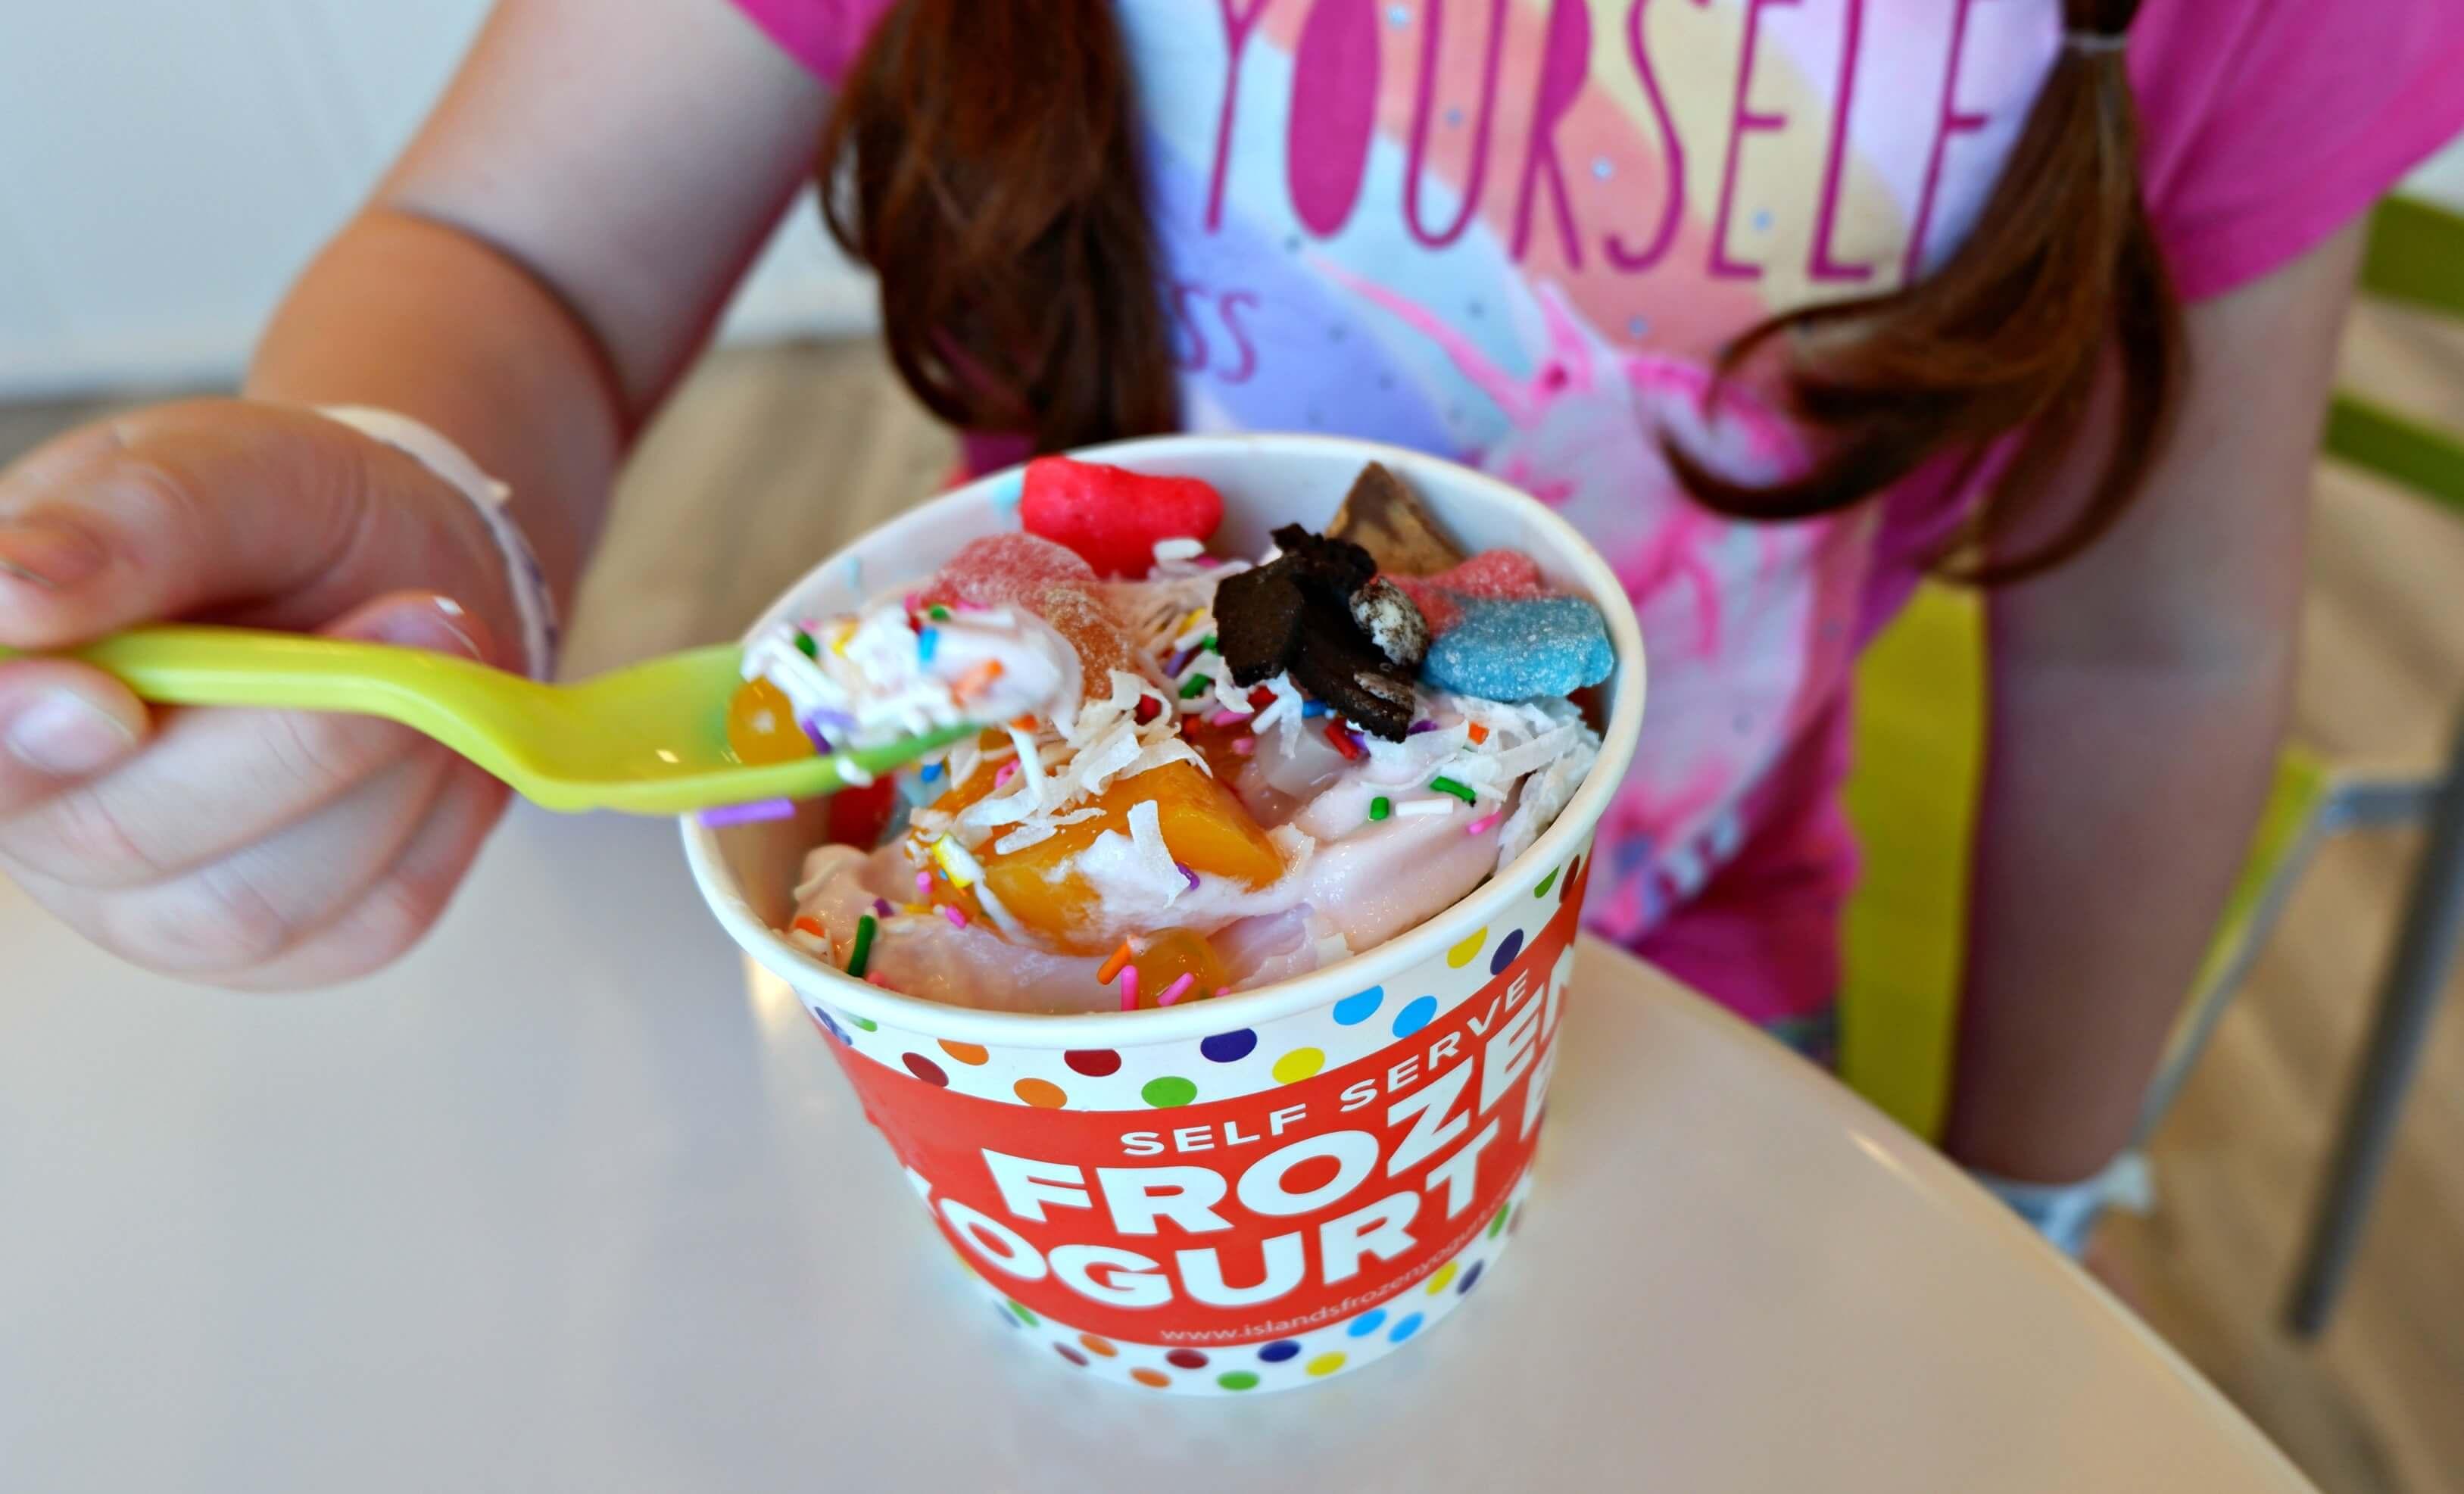 cavendish pei rainy day ideas family fun where to eat with kids pickle planet moncton island's frozen yogurt